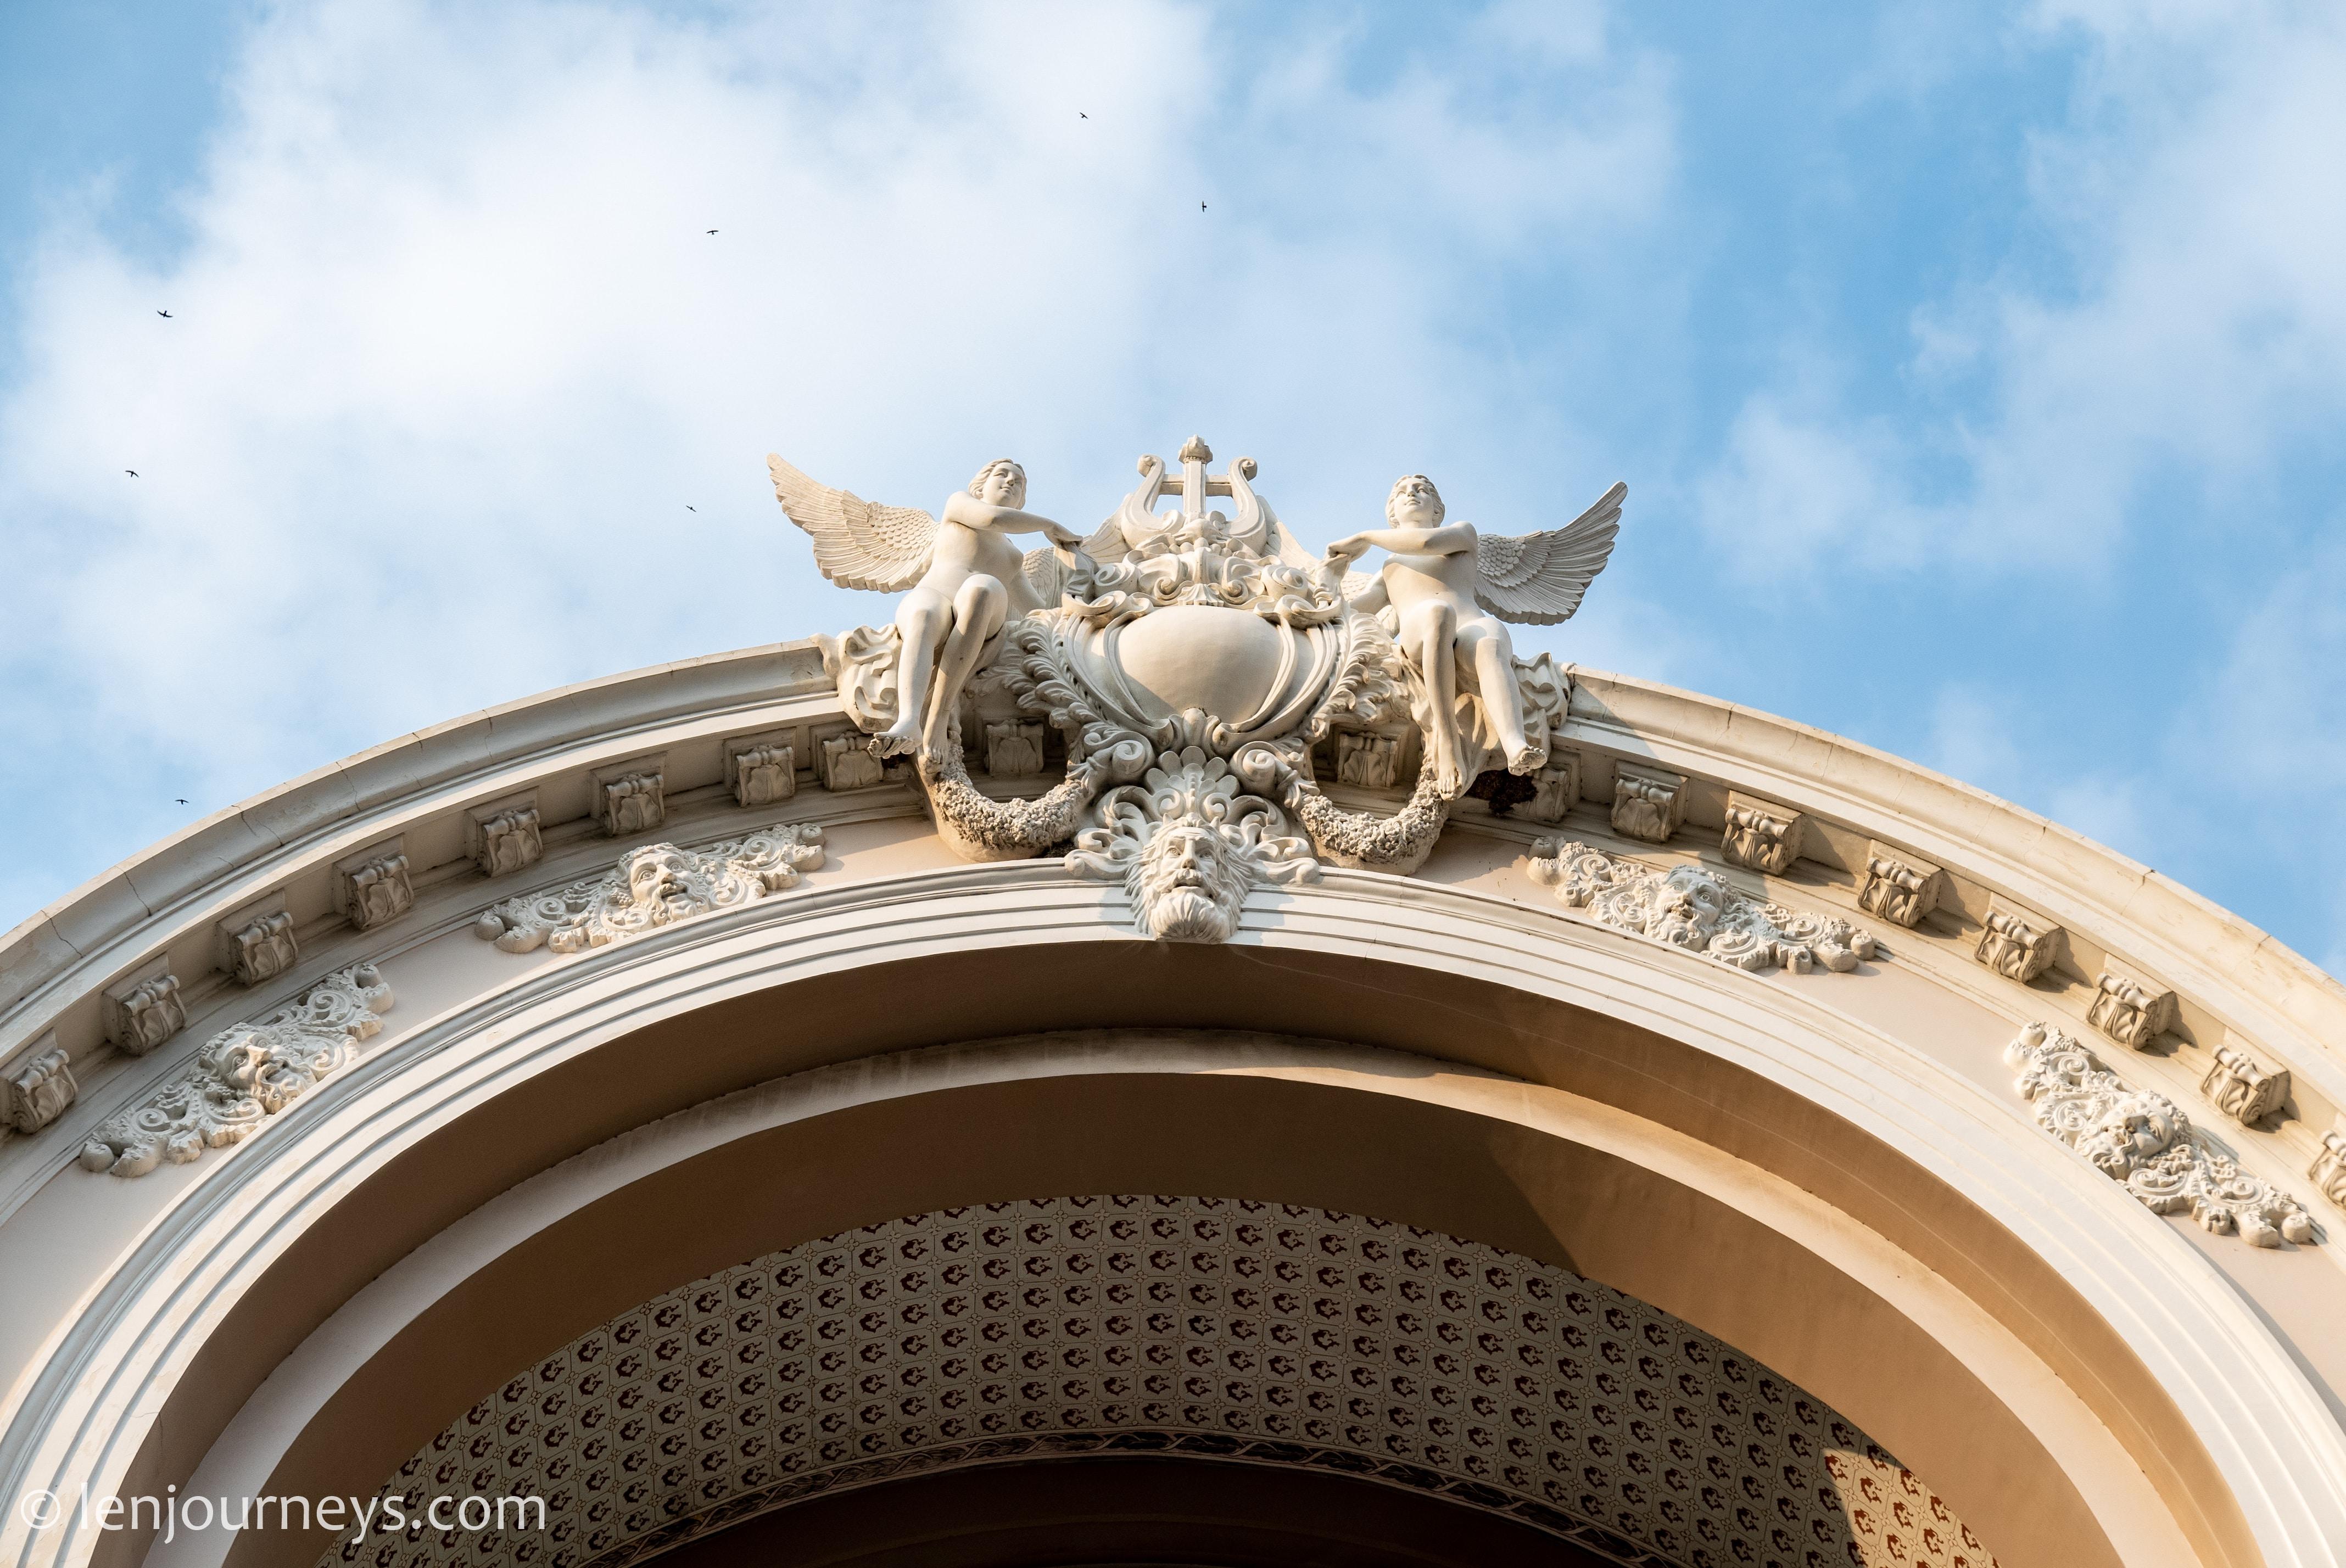 Muse statue, Saigon Opera House